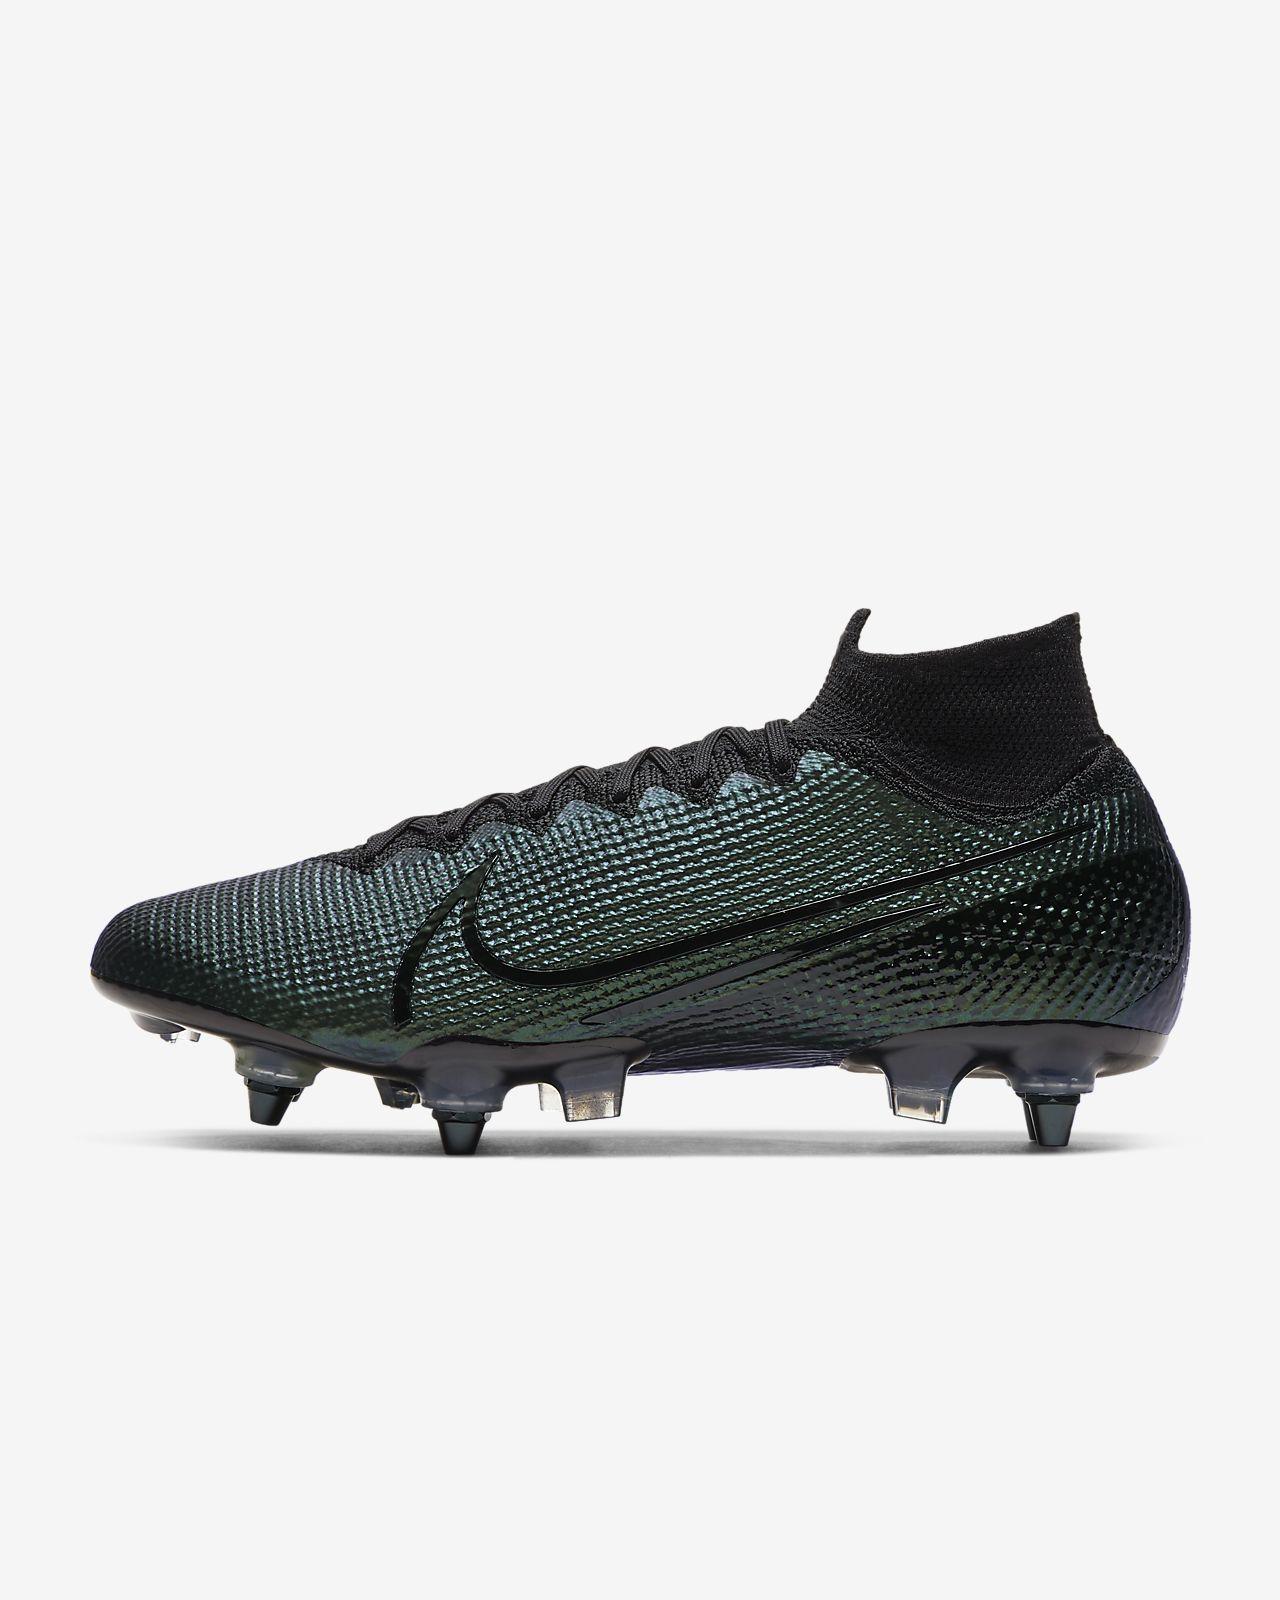 Chuteiras de futebol para terreno mole Nike Mercurial Superfly 7 Elite SG PRO Anti Clog Traction